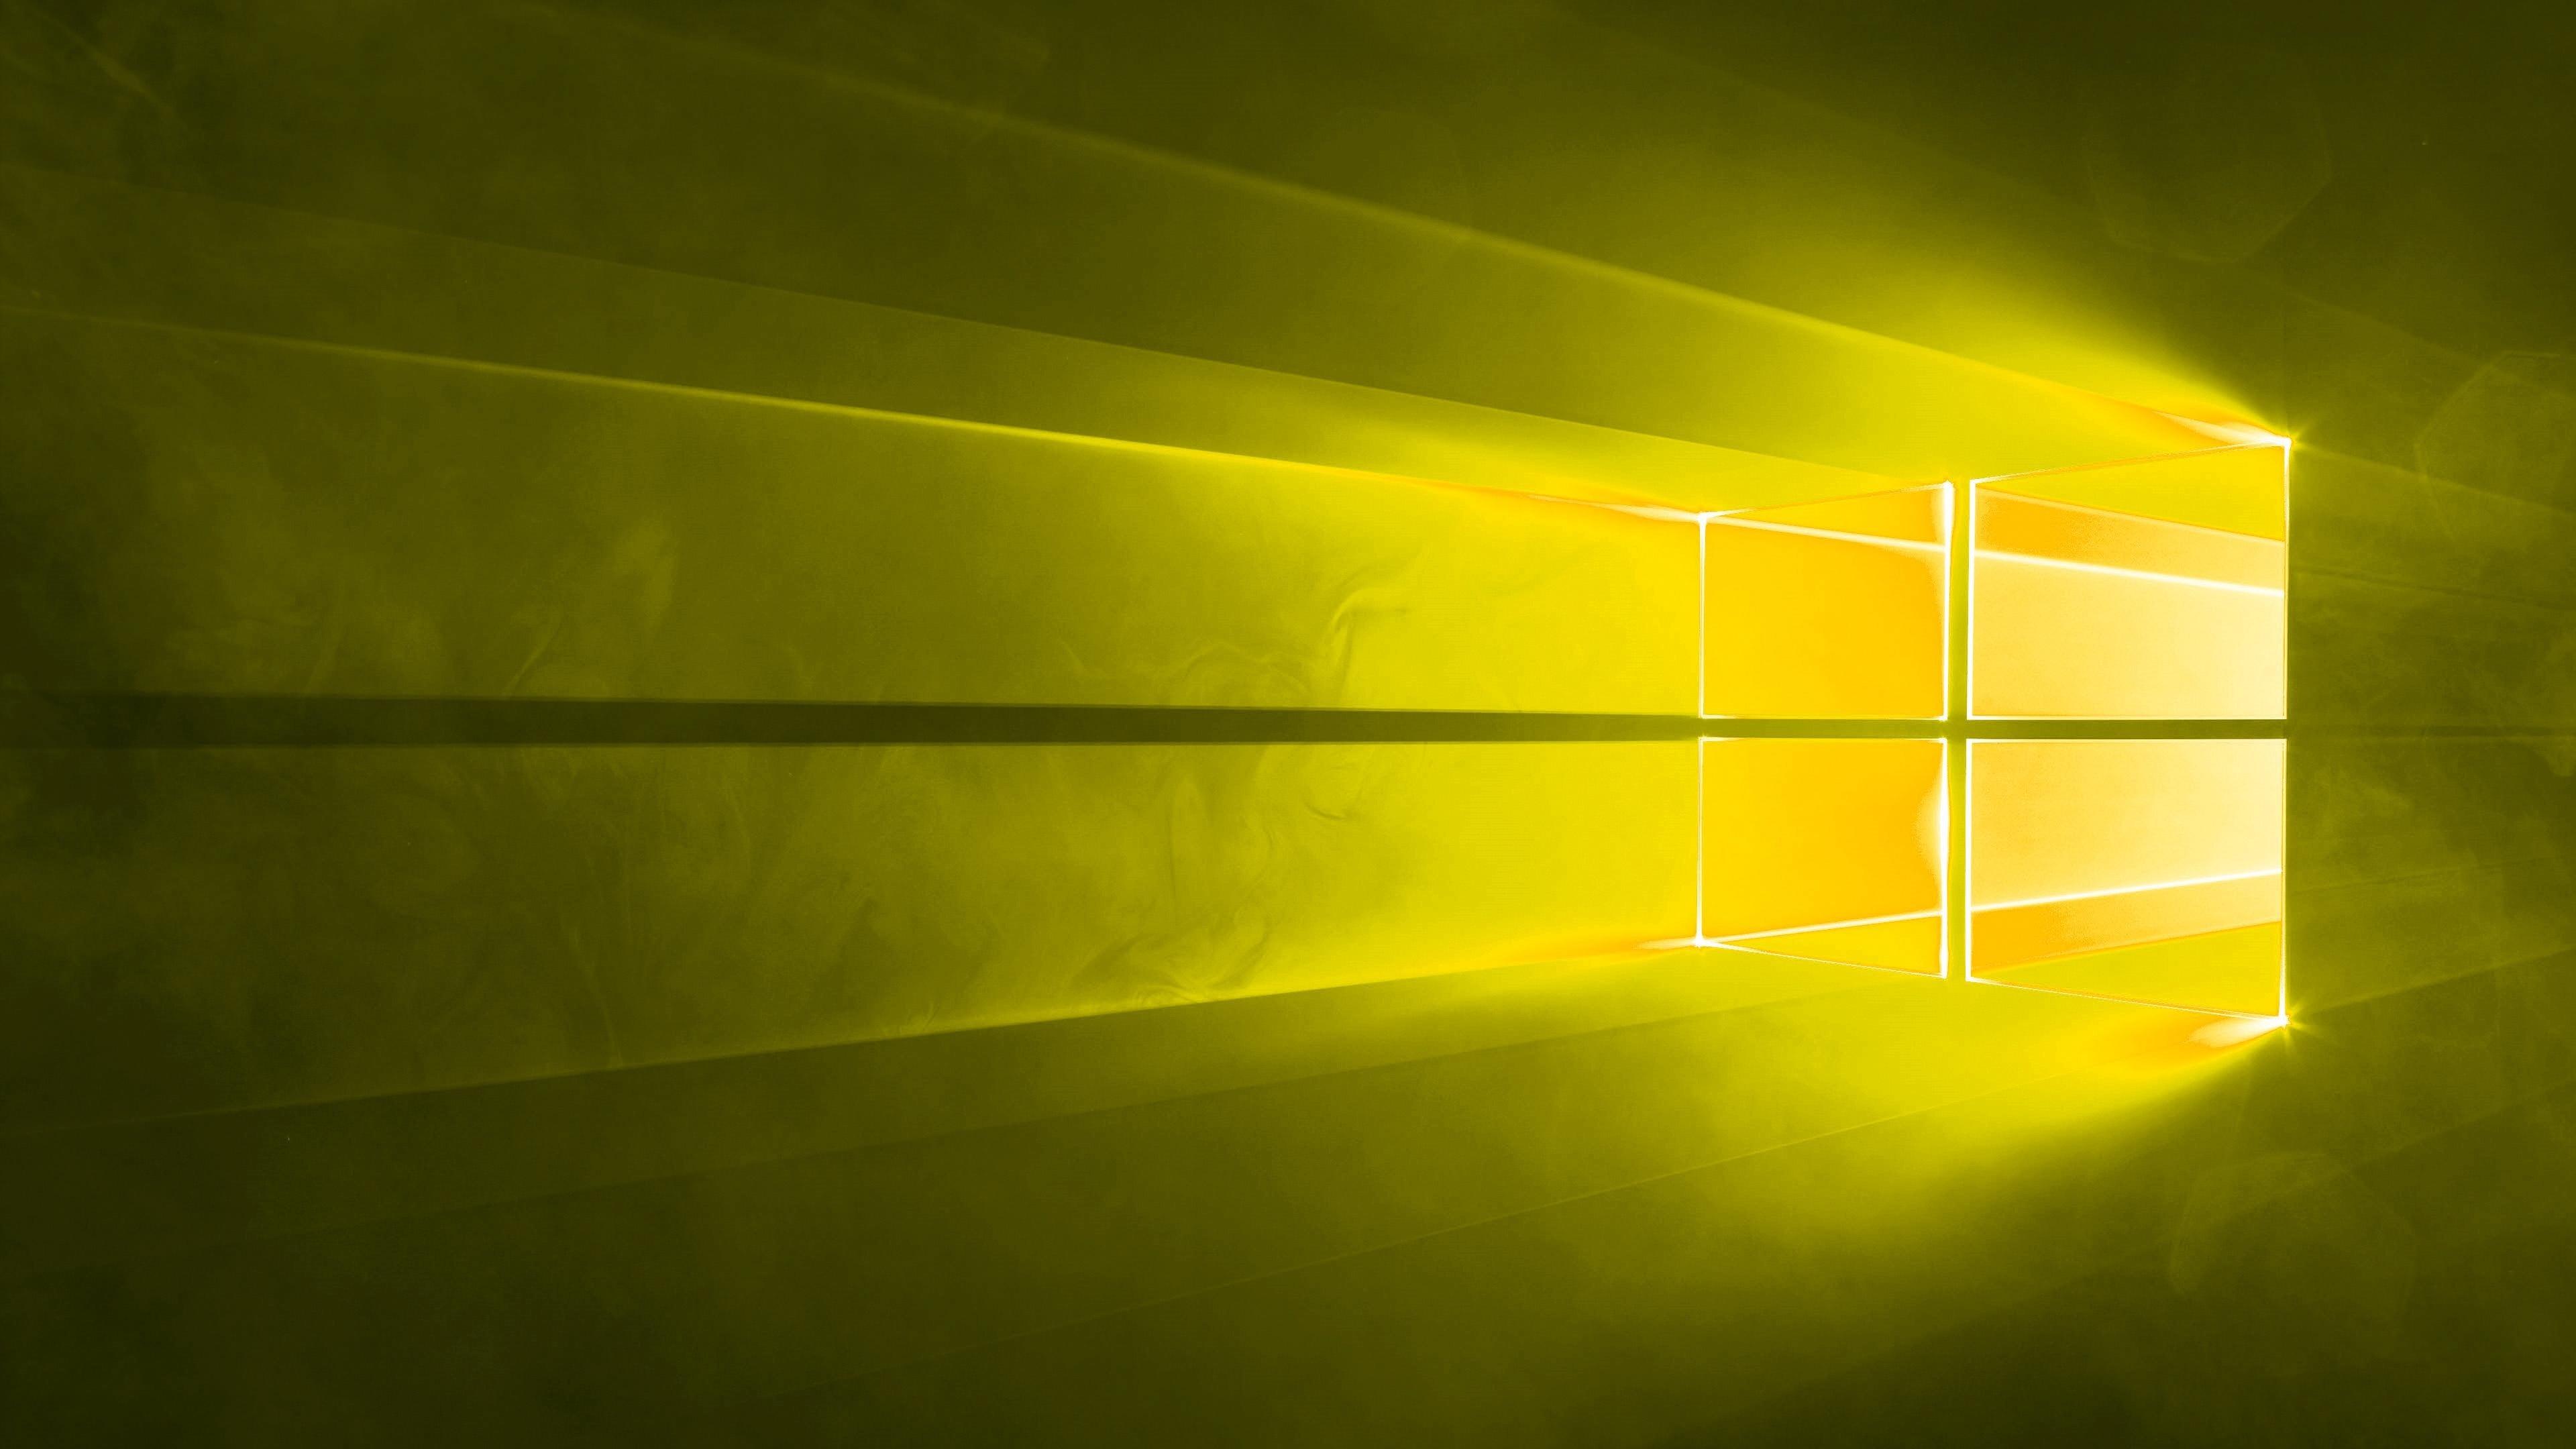 Windows 10 yellow